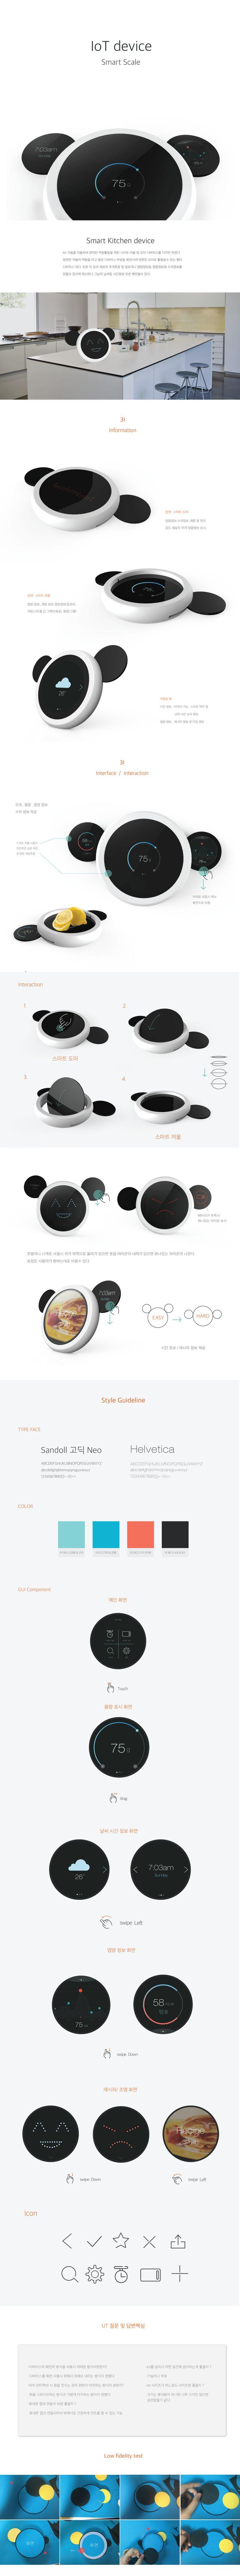 Circle display_Smart scale